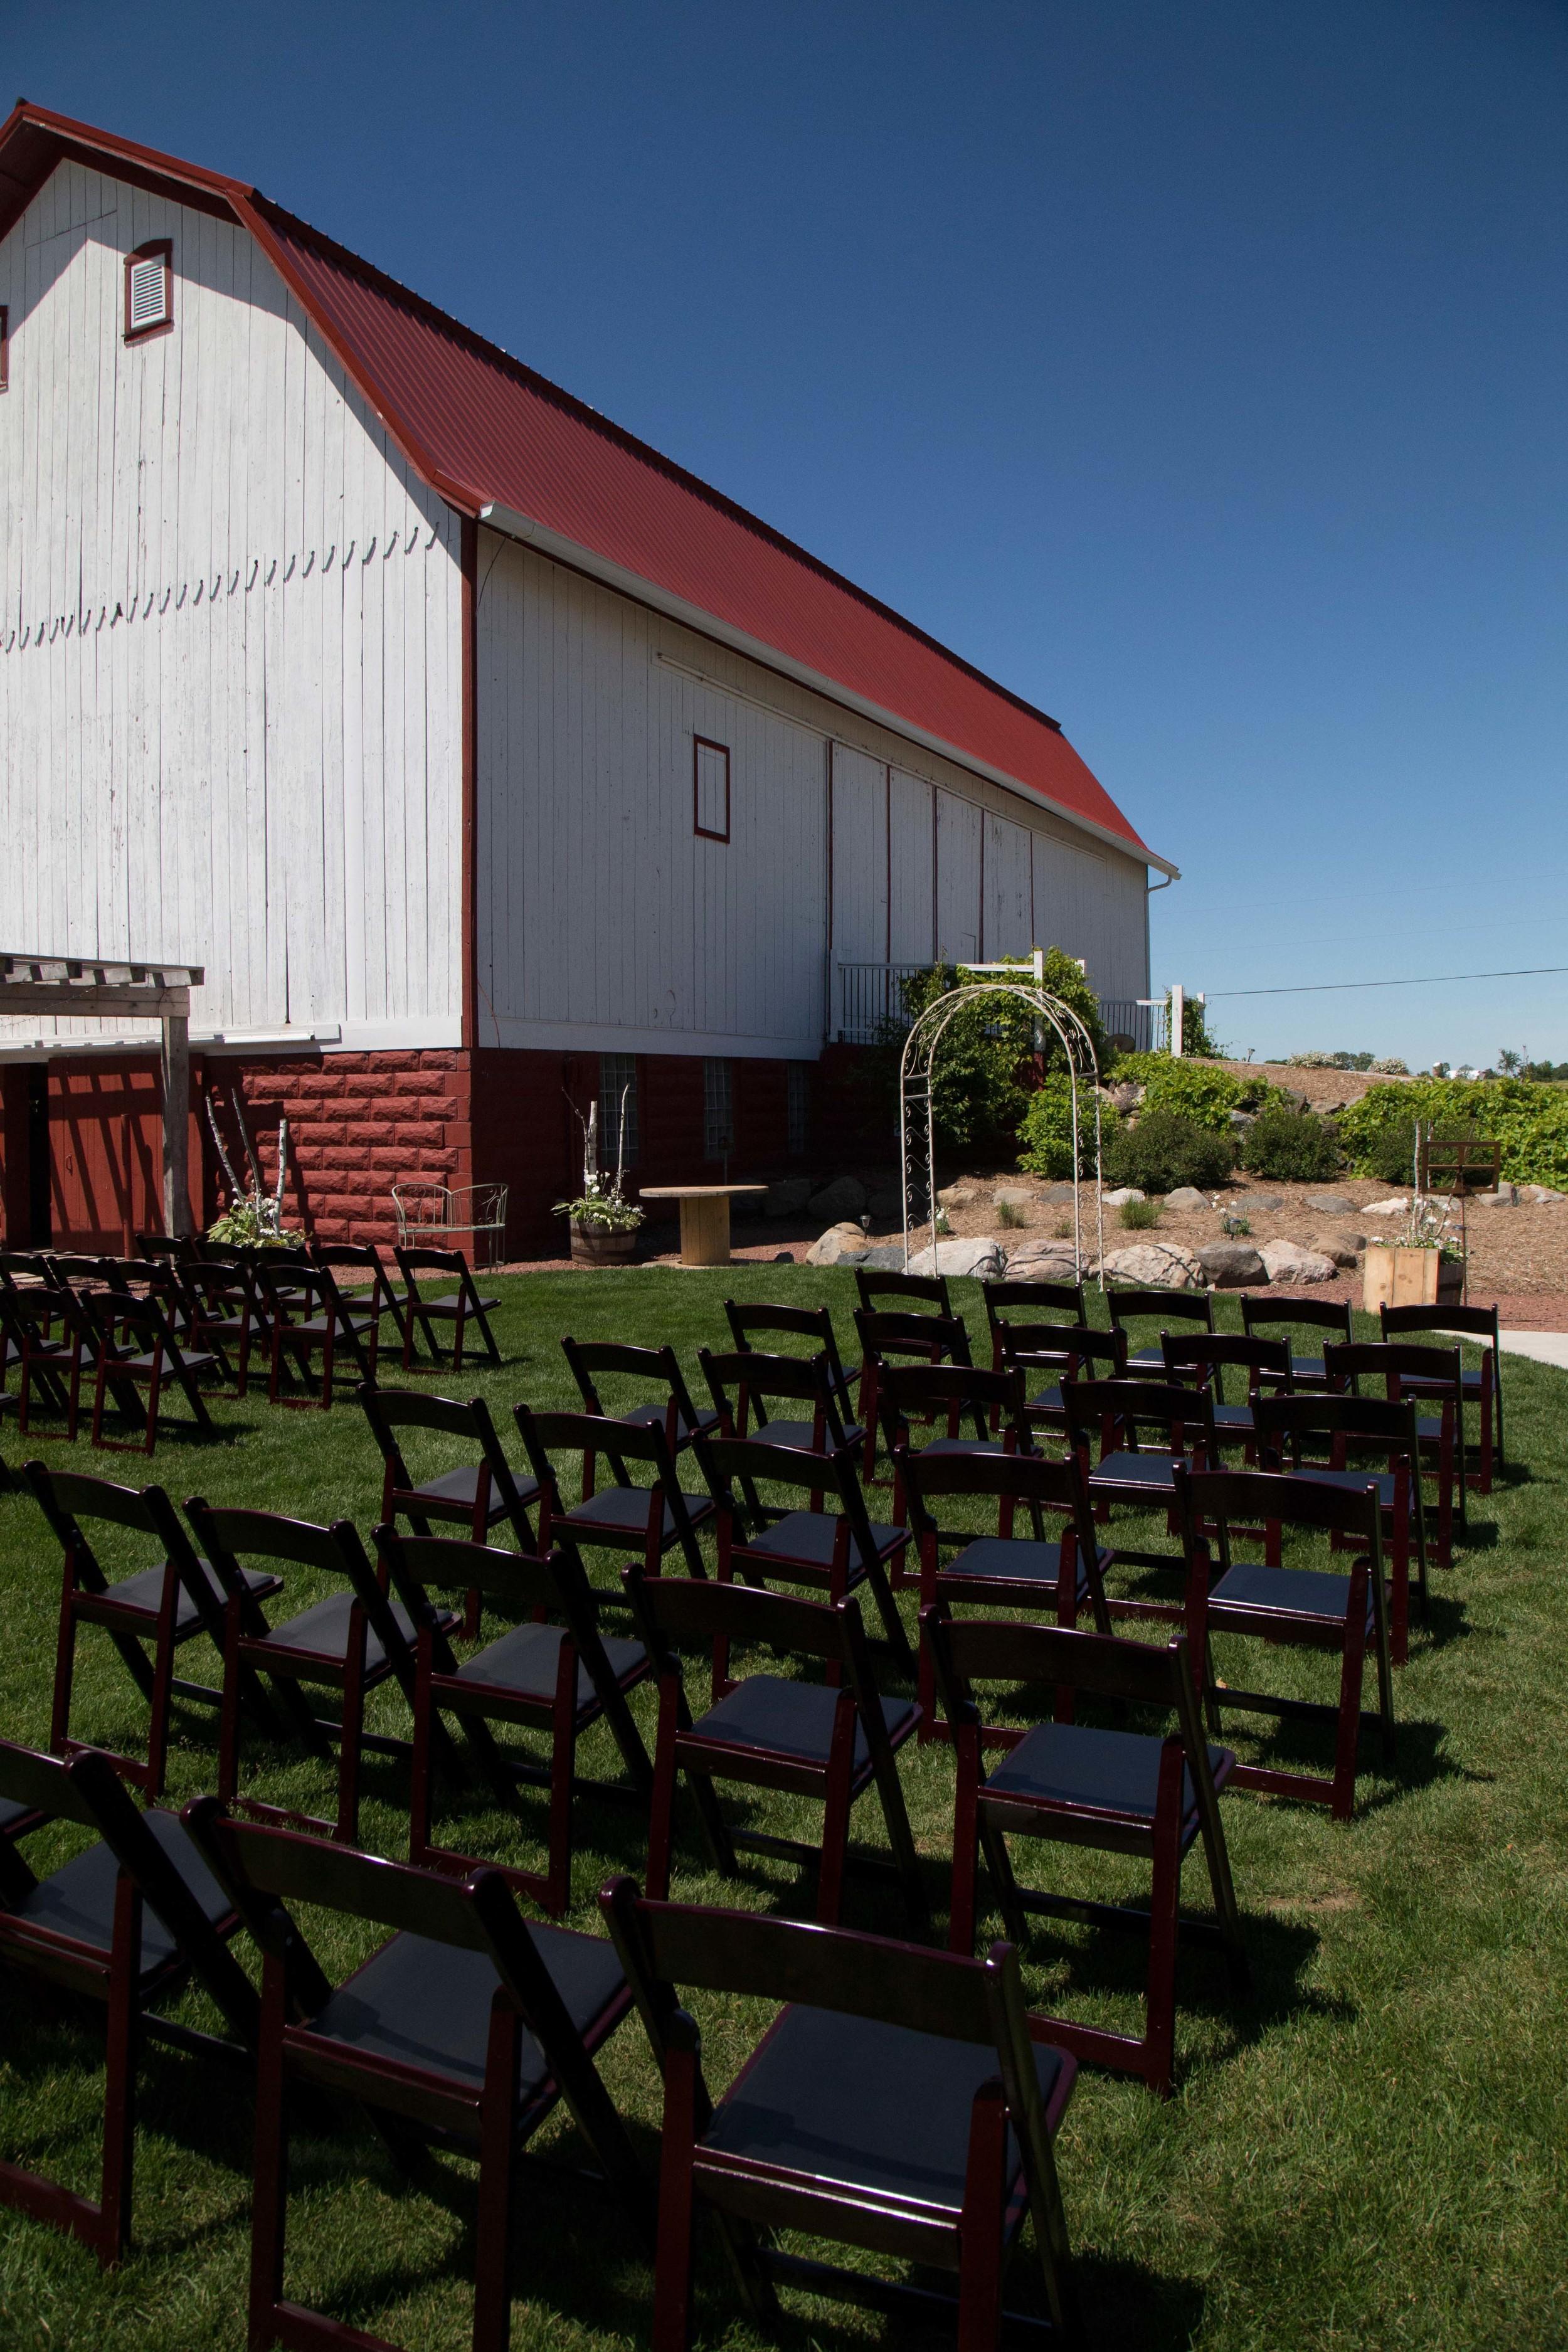 6_19-Courtyard_Ceremony_Mahogany_chairs_5697 2.jpg